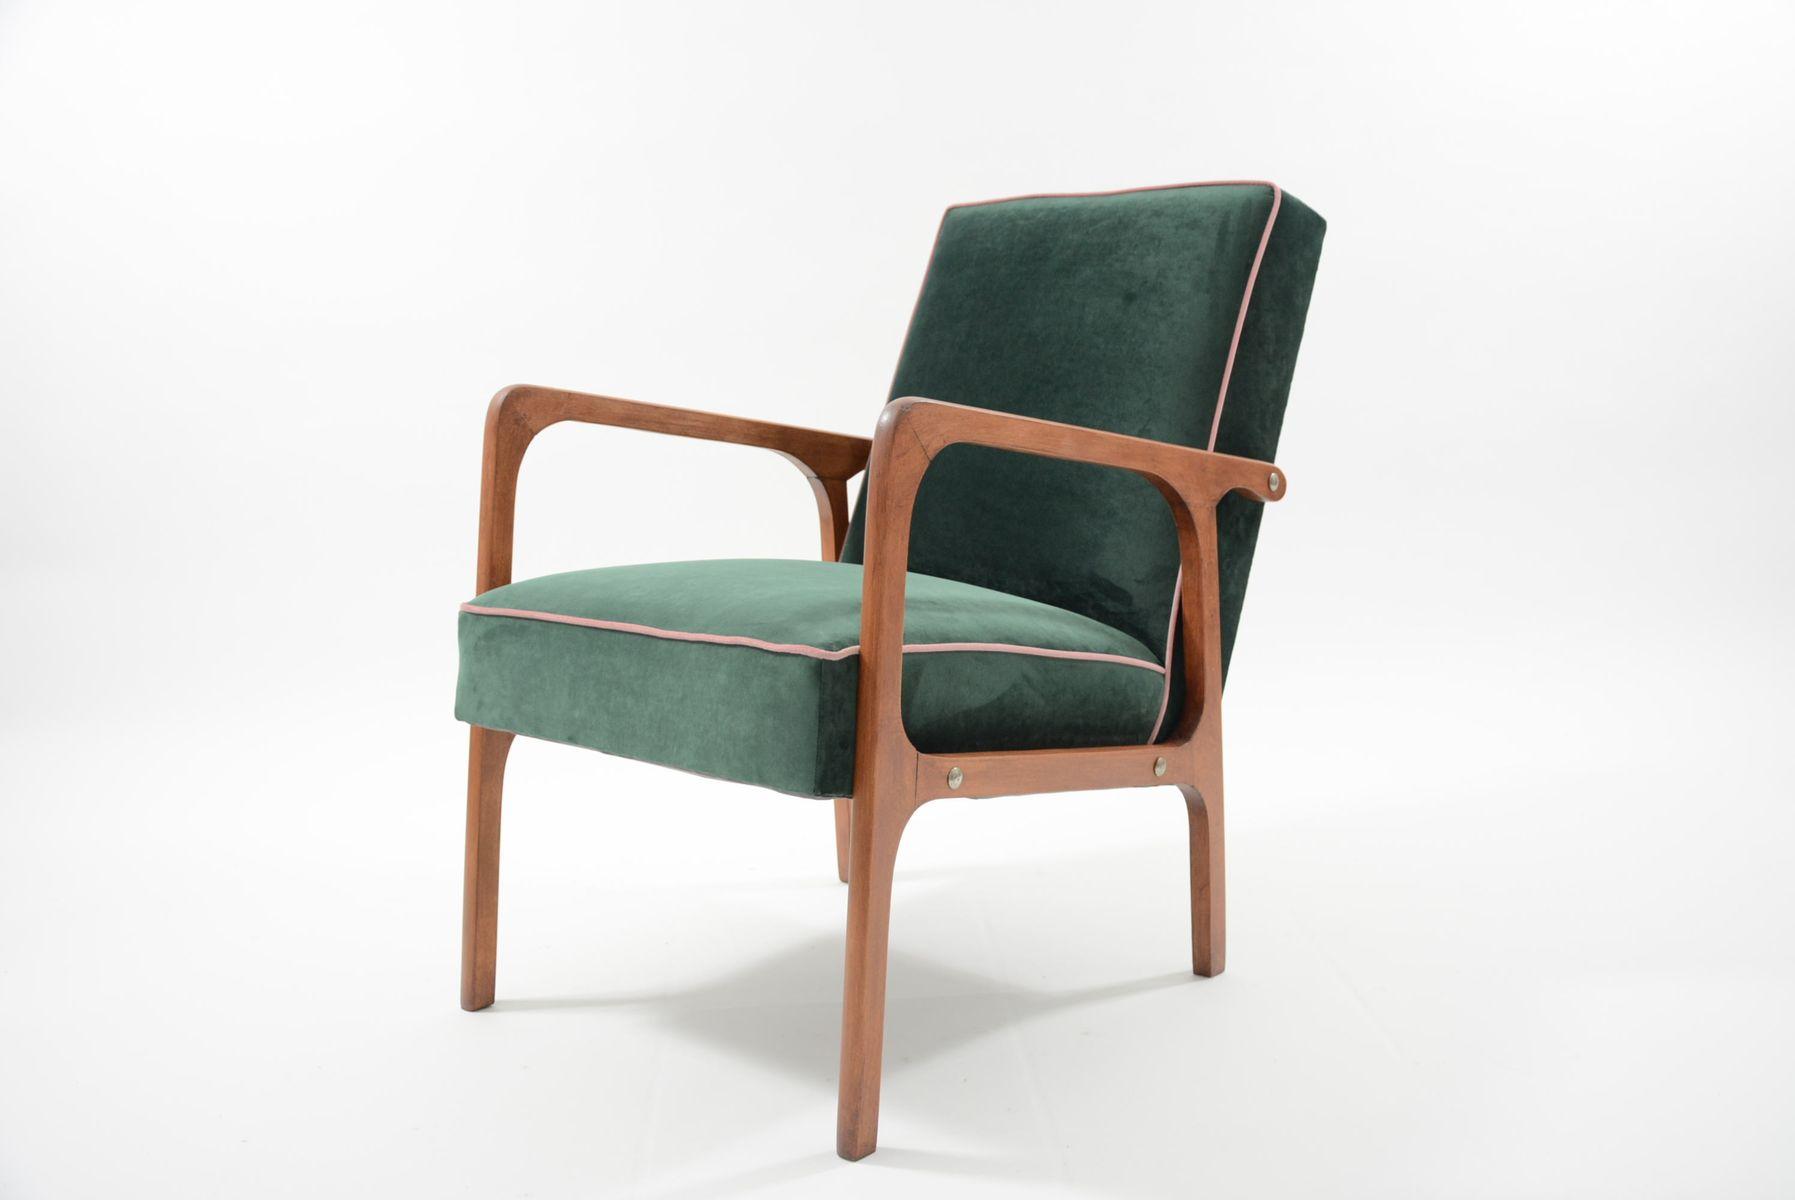 Kadr Vintage Sessel aus waldgrünem Samt, 1960er